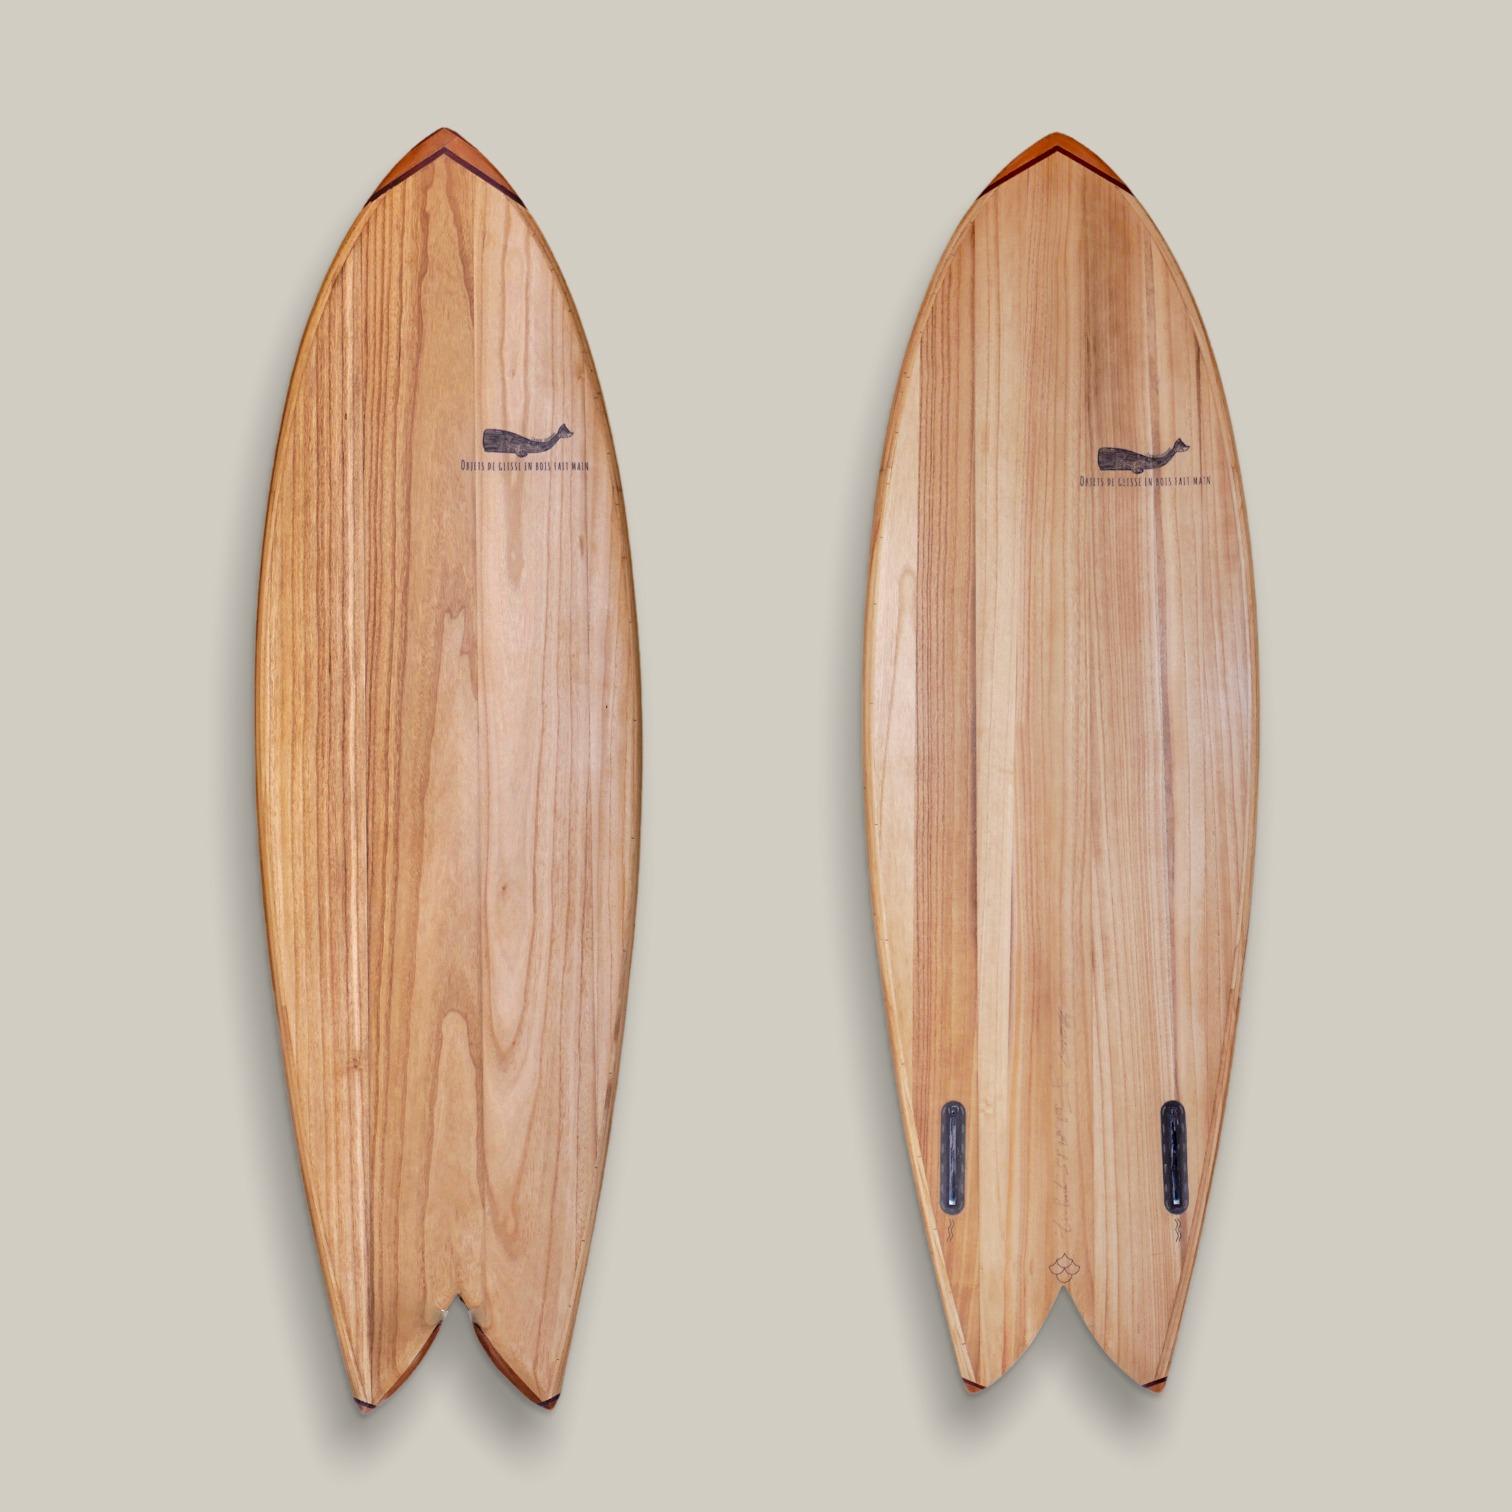 Cachalot Surfboards paulownia planche surf handmade artisan shaper hollow bois